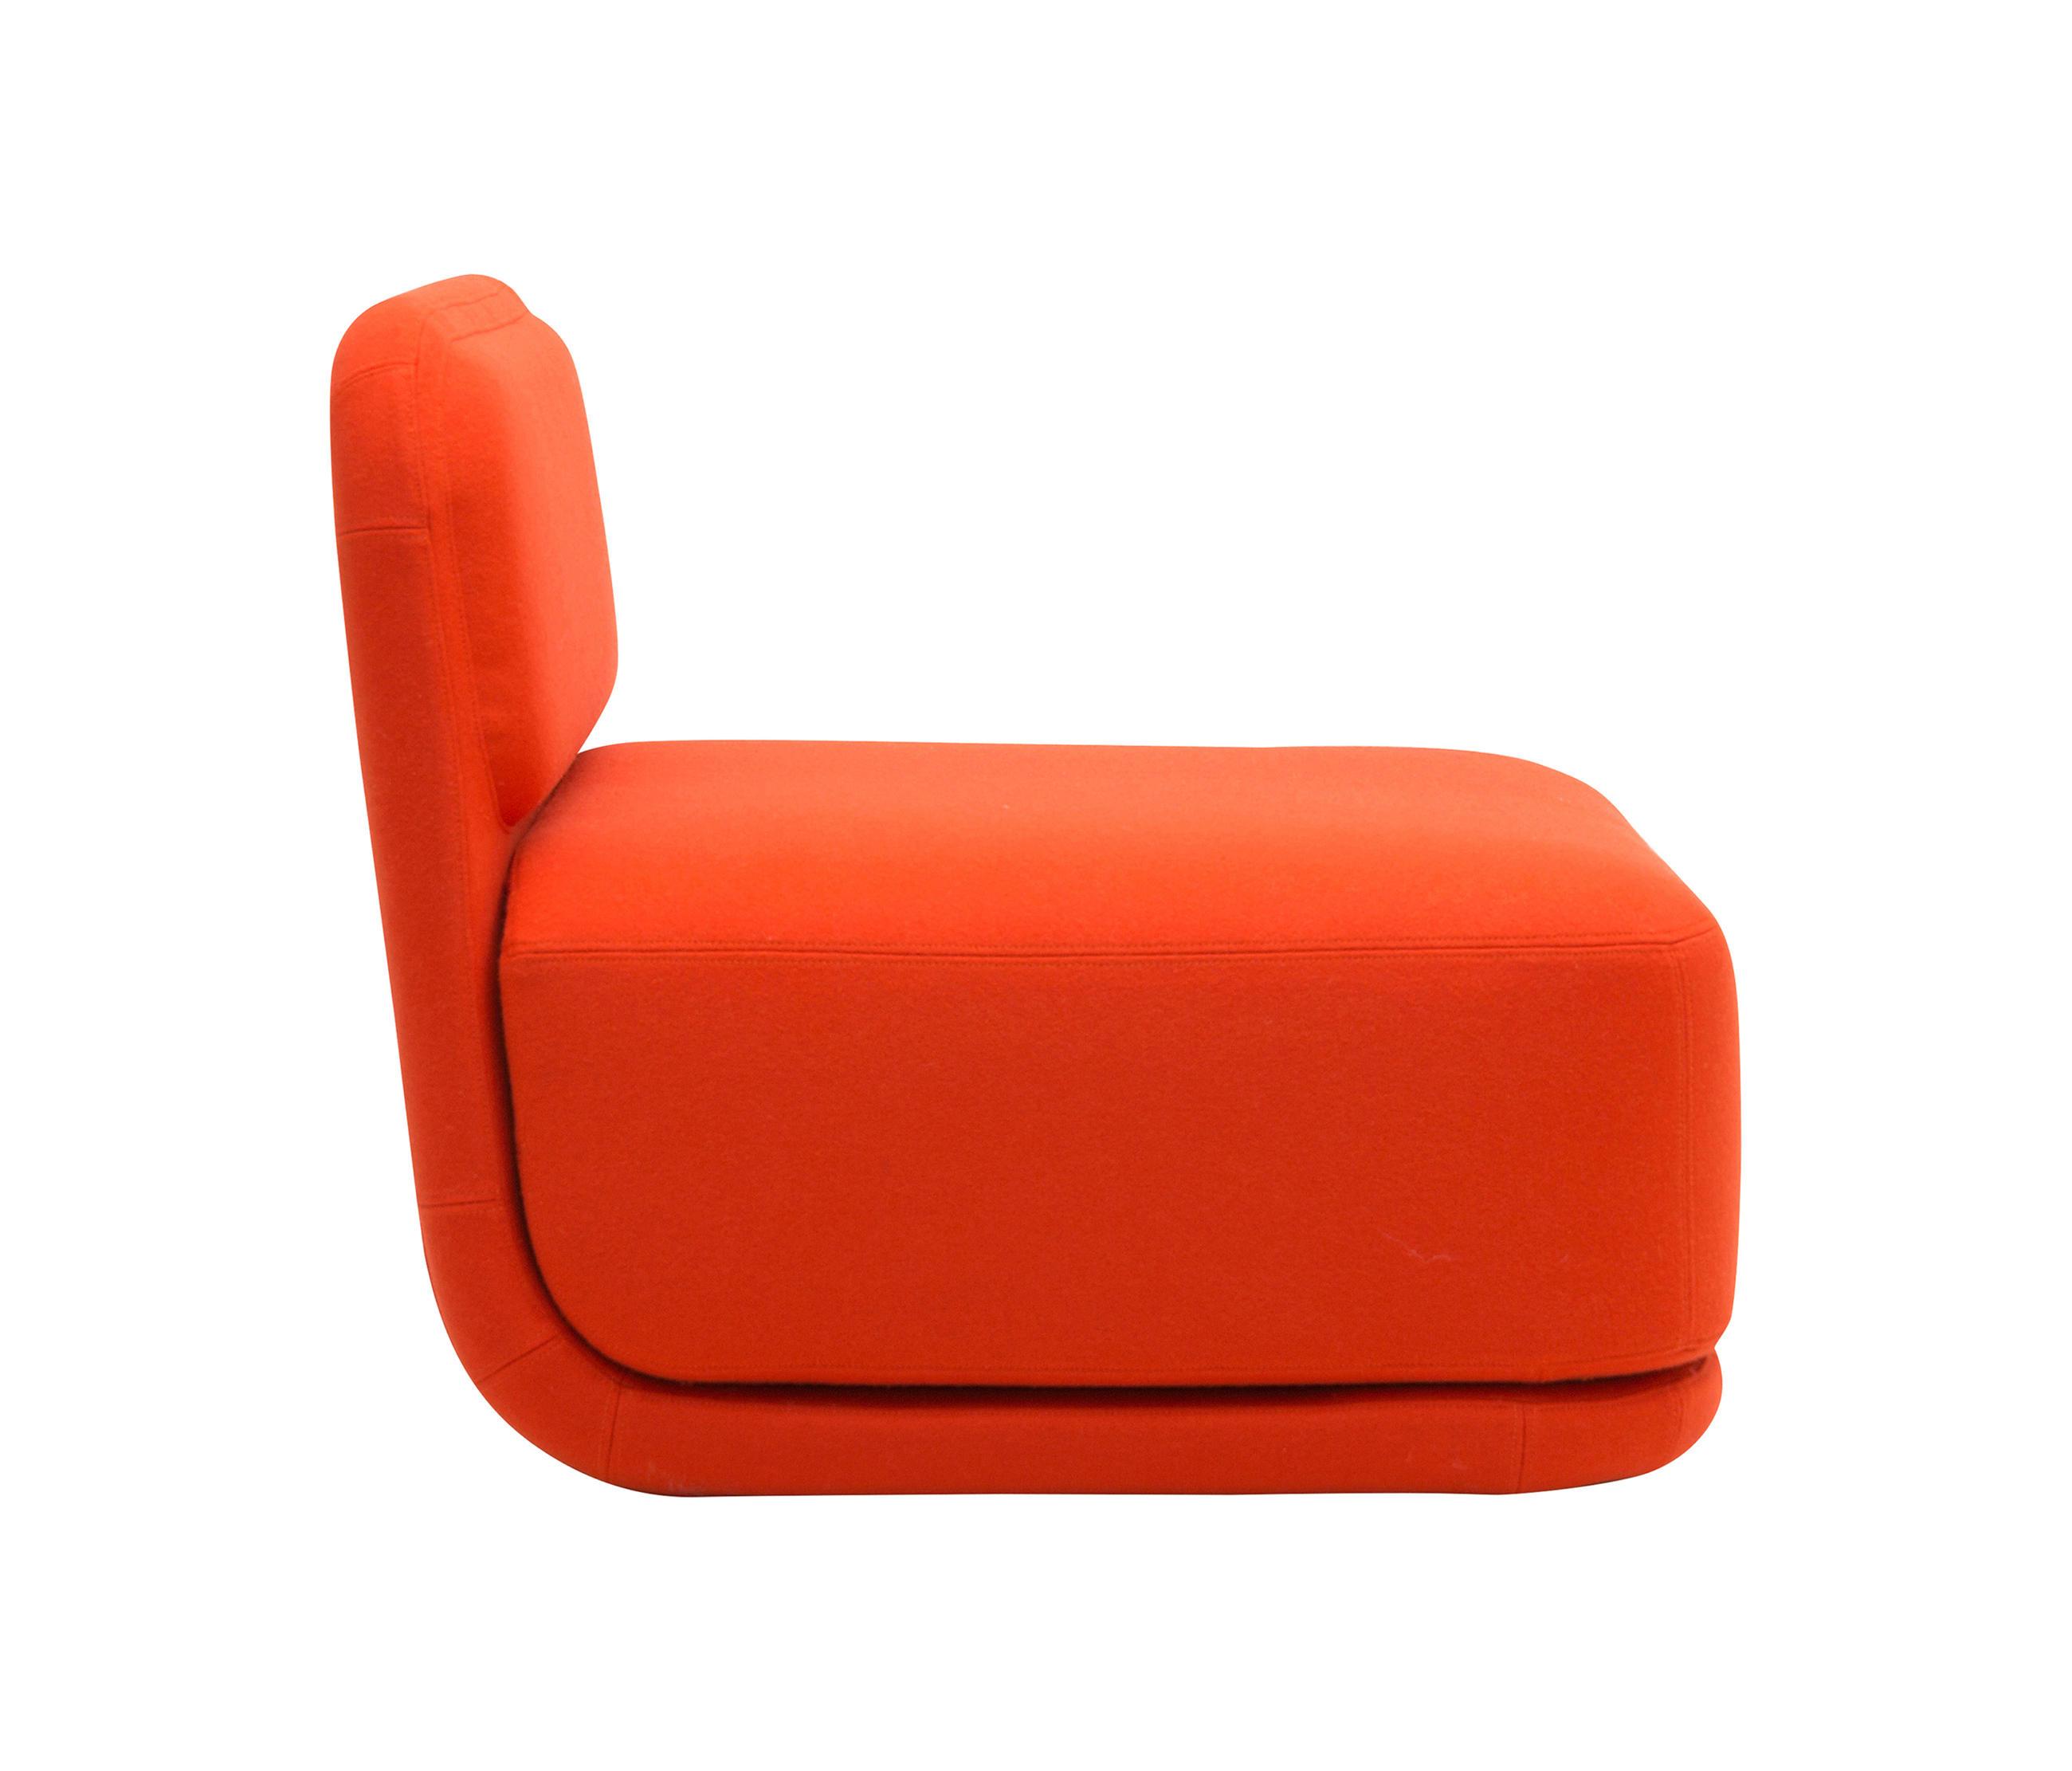 standby chaise dossier bas lounge si ges de travail de softline a s architonic. Black Bedroom Furniture Sets. Home Design Ideas